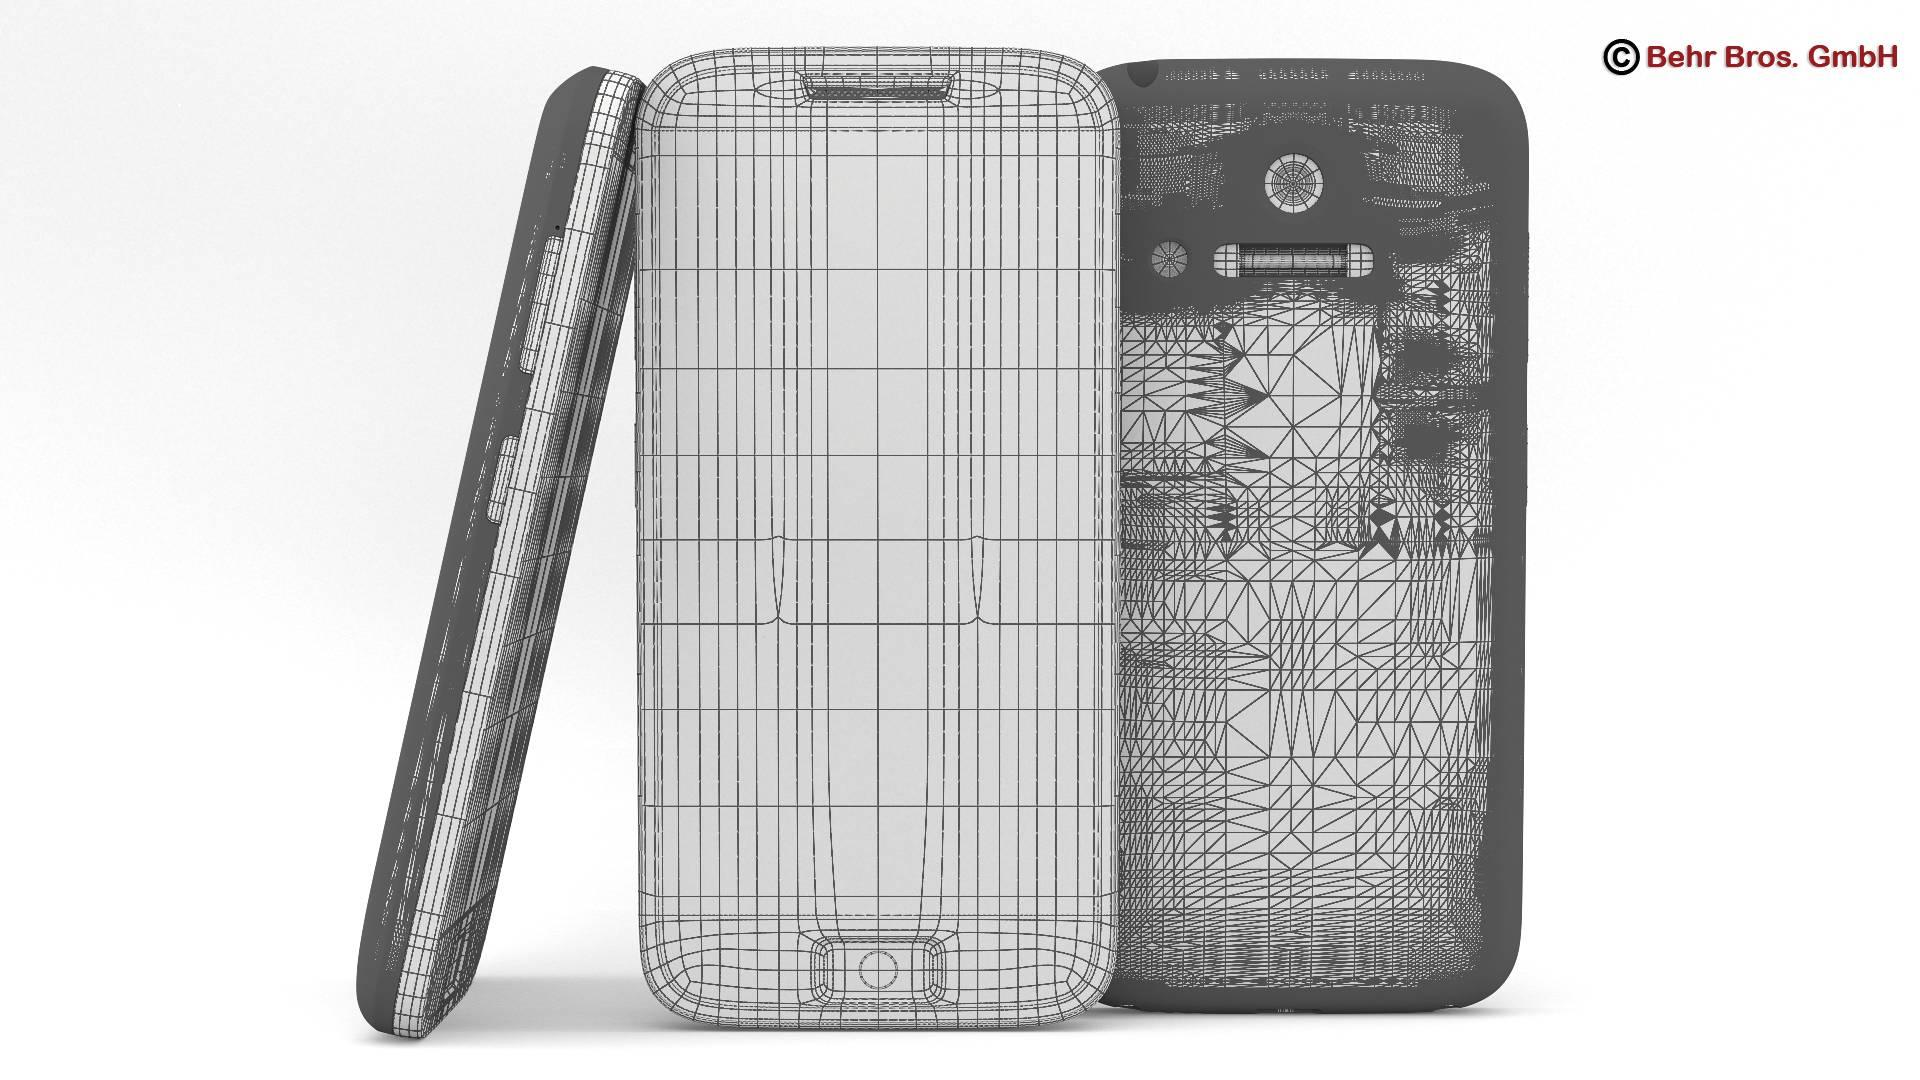 generic smartphone 4 inch 3d model 3ds max fbx c4d lwo ma mb obj 161633